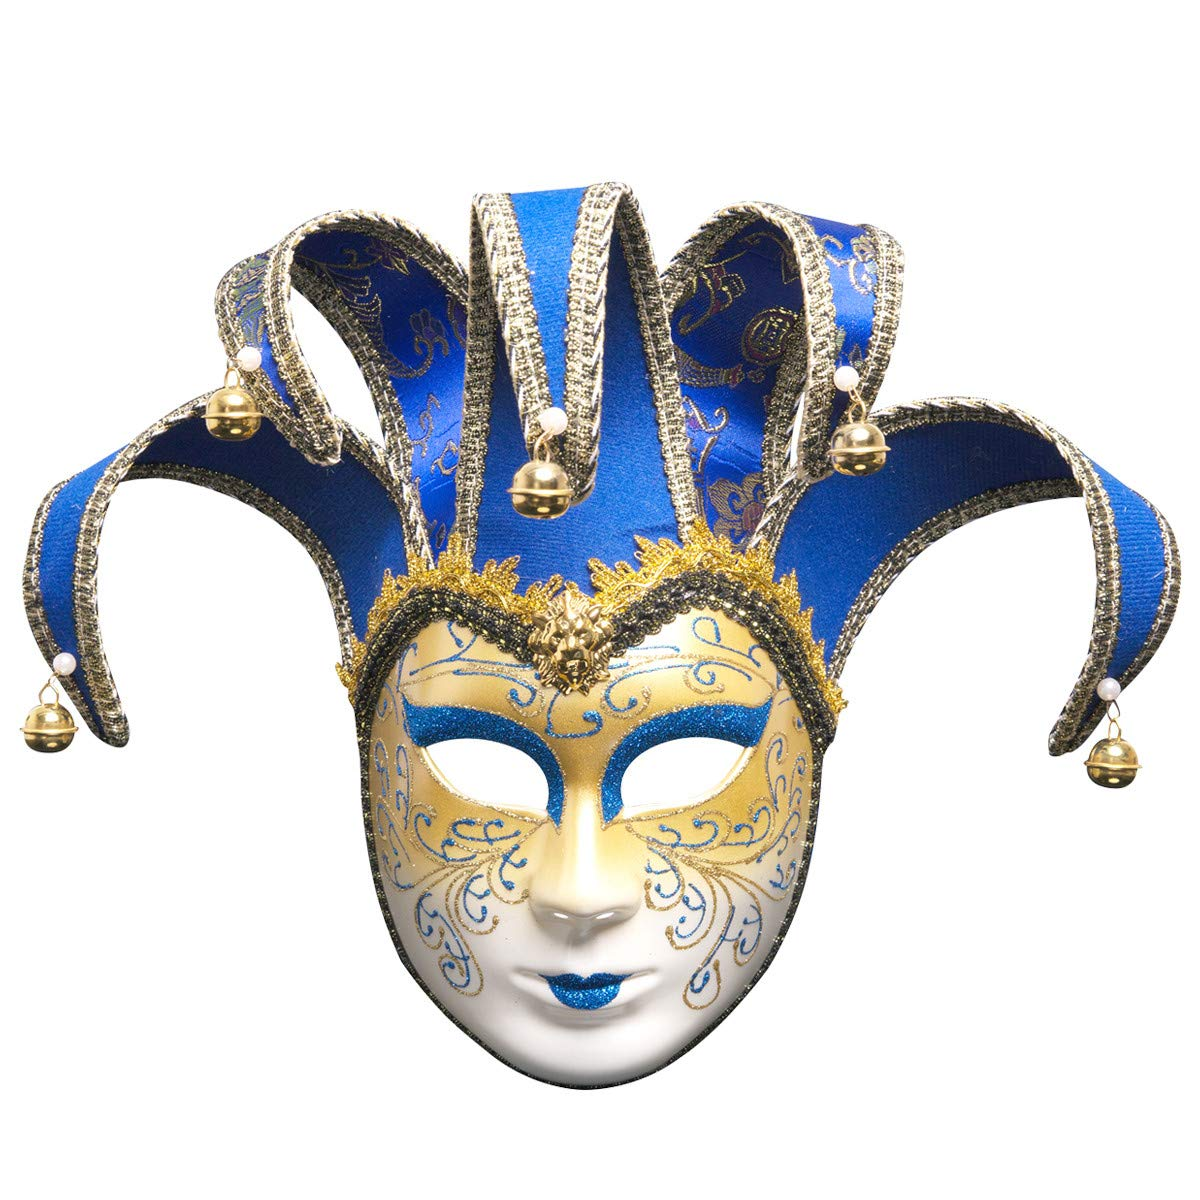 Sonmer Full Face Venetian Joker Masquerade Theater Mask, Mardi Gras Party Ball Mask (Blue)